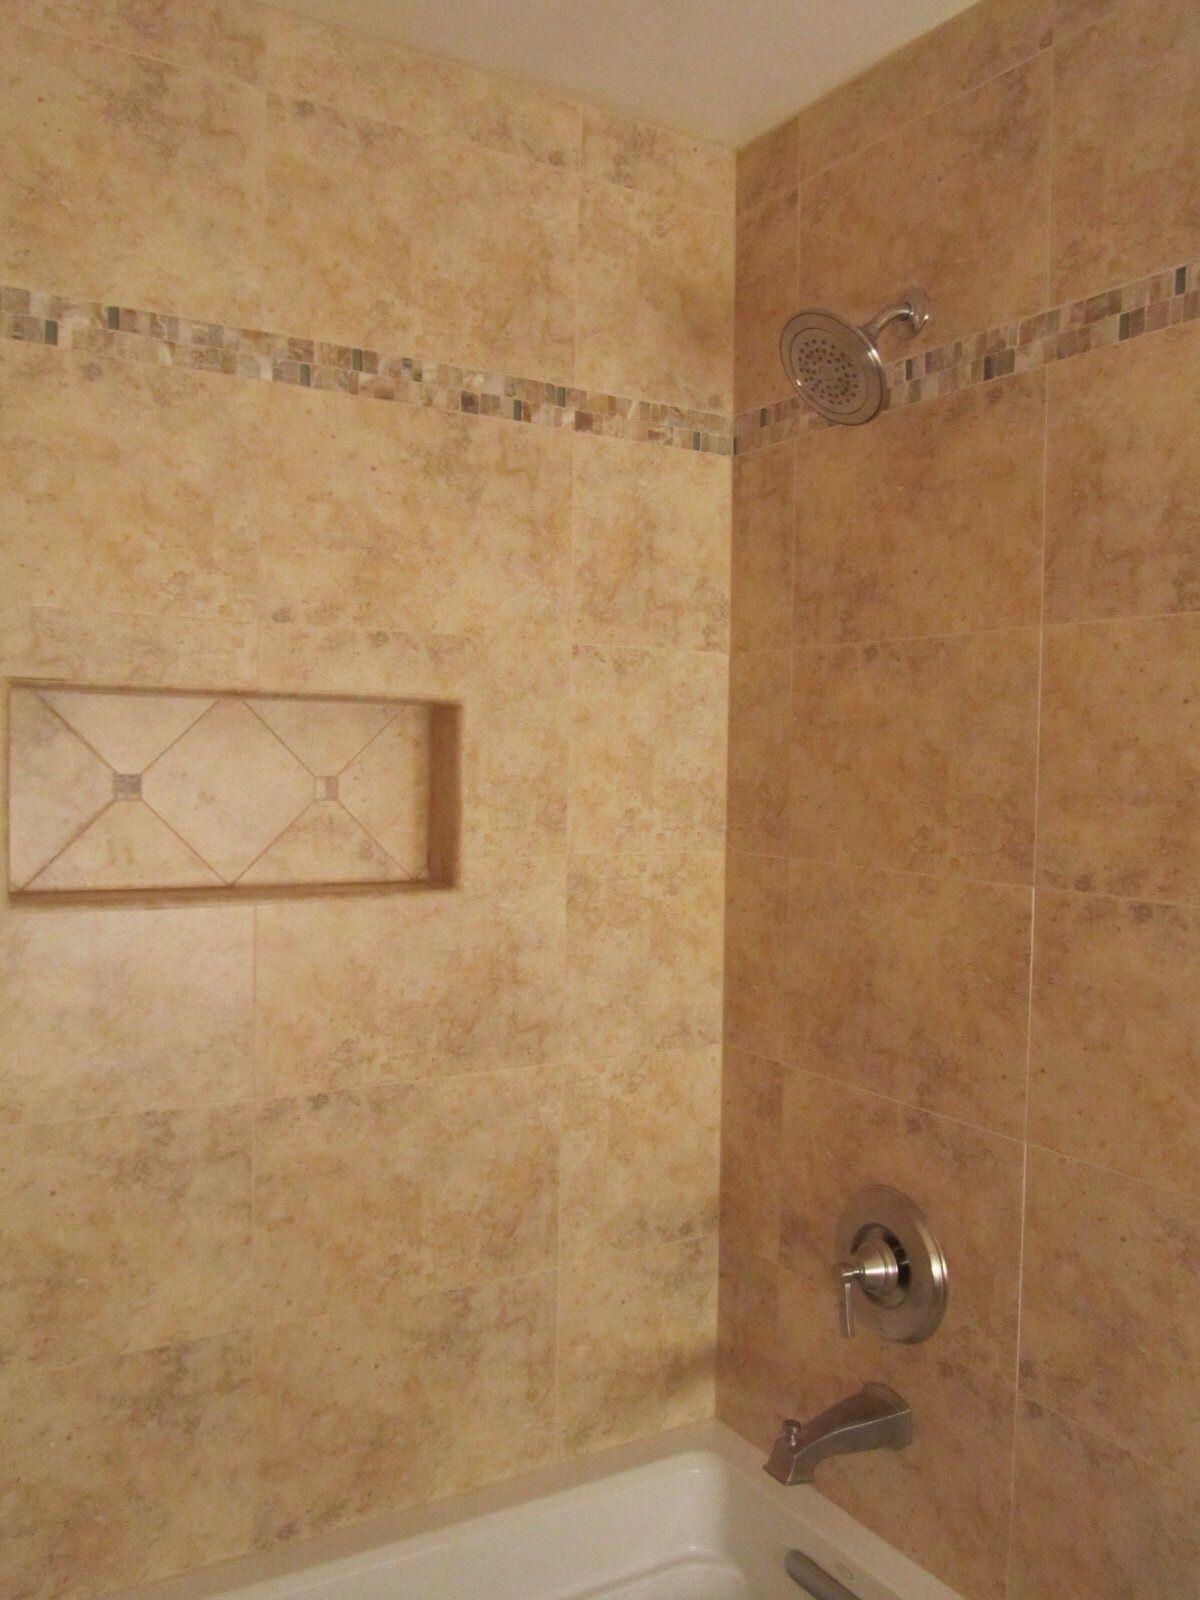 Bathroom Tile Earth Tones Colors Share In 2019 Bathtub